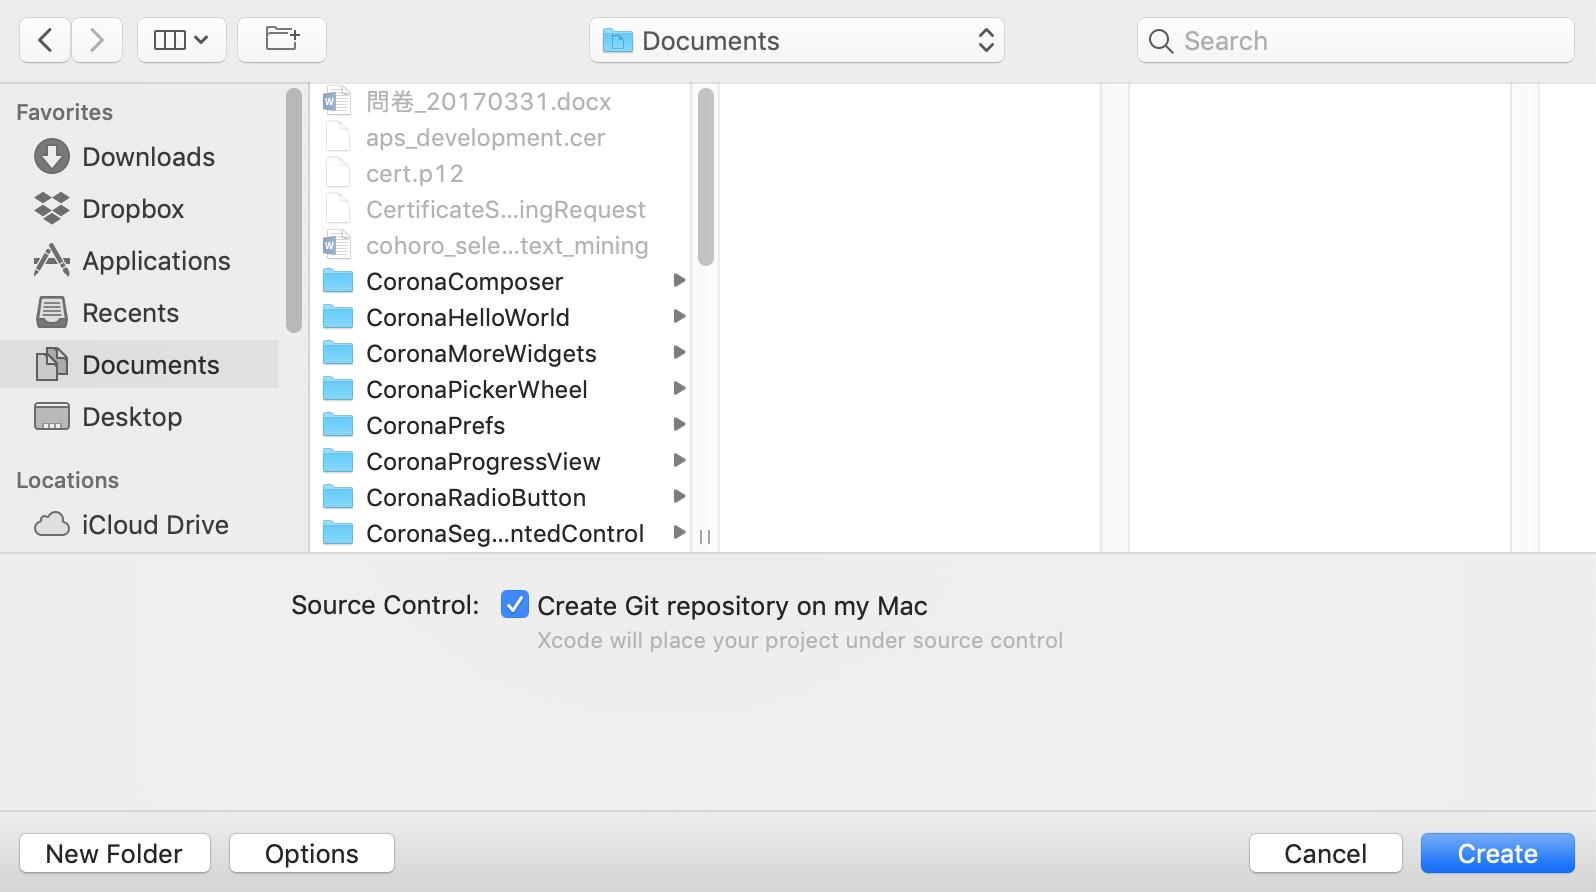 選擇 Xcode 專案位置